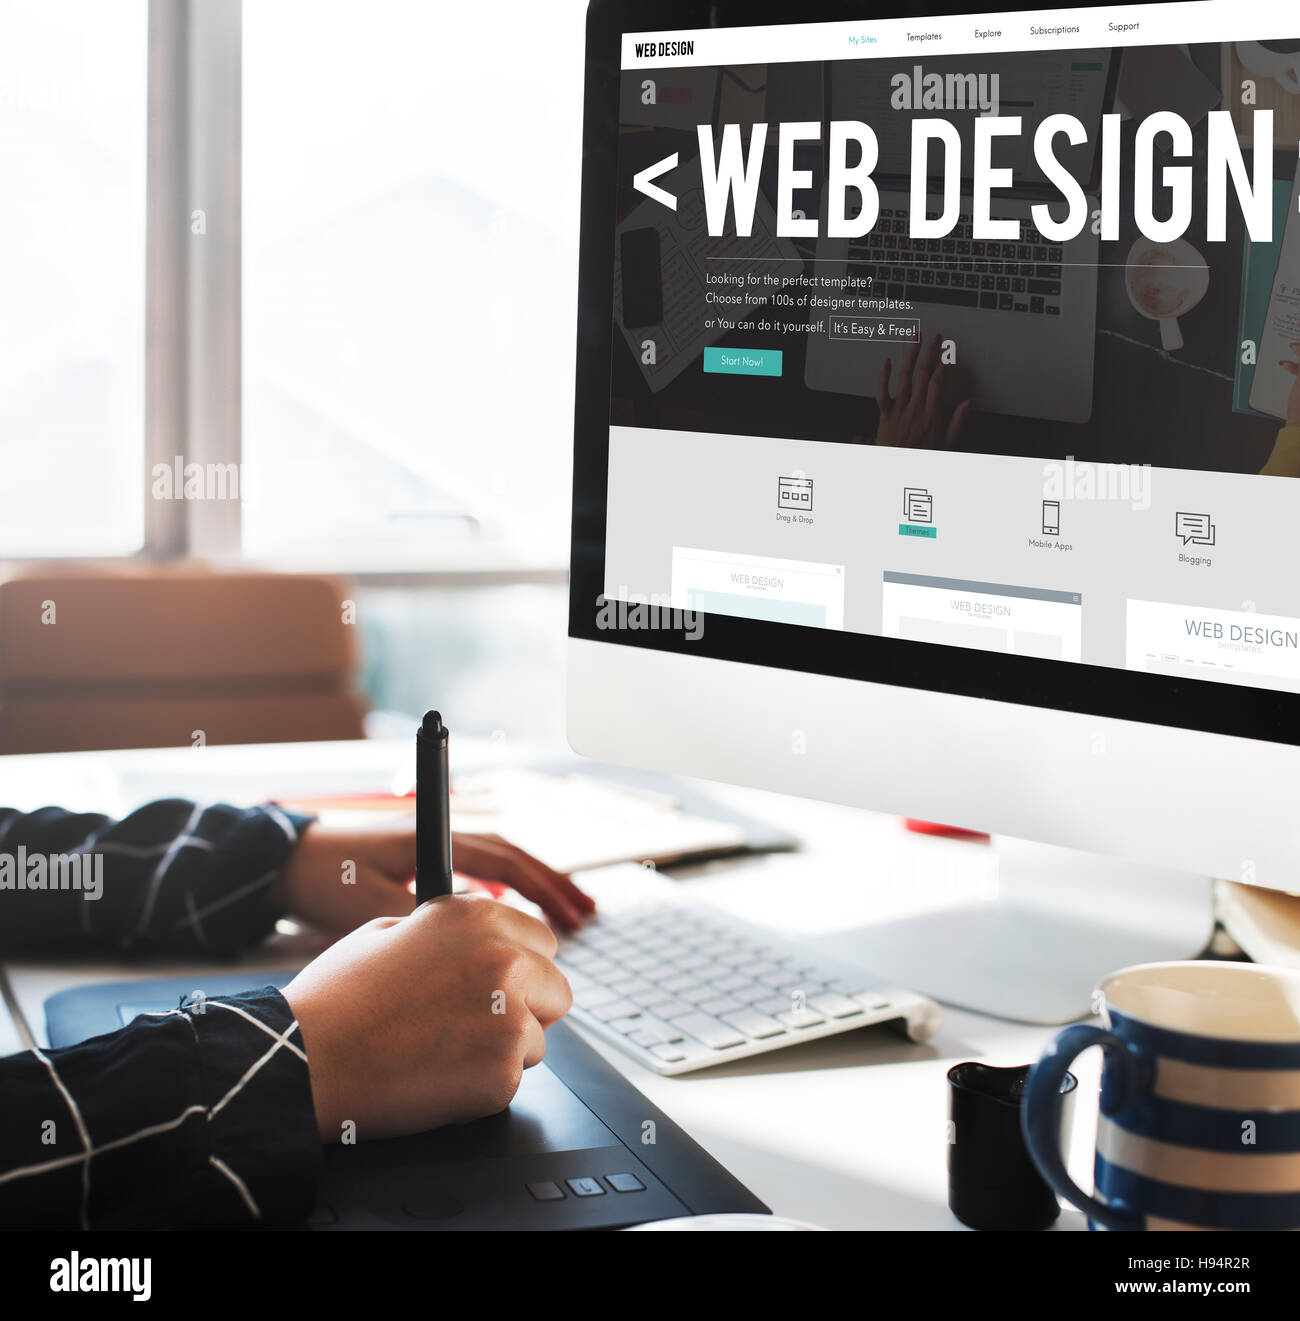 Web design internet website responsive software concept stock photo web design internet website responsive software concept solutioingenieria Gallery